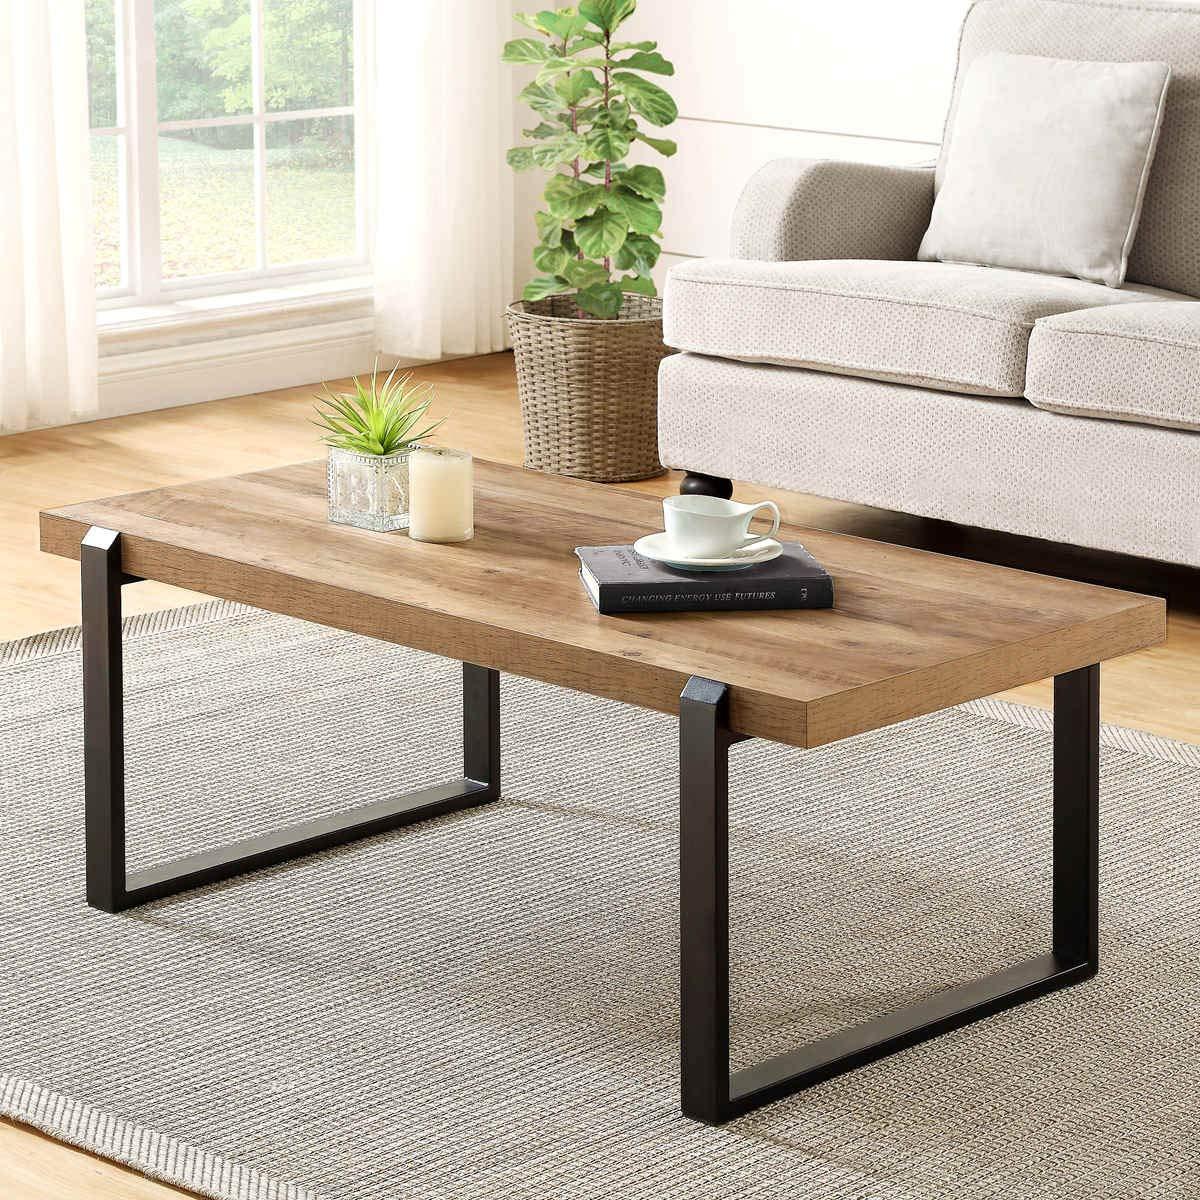 FOLUBAN Rustic Coffee Table,Wood and Metal Industrial Cocktail Tablefor Living Room, Oak by FOLUBAN